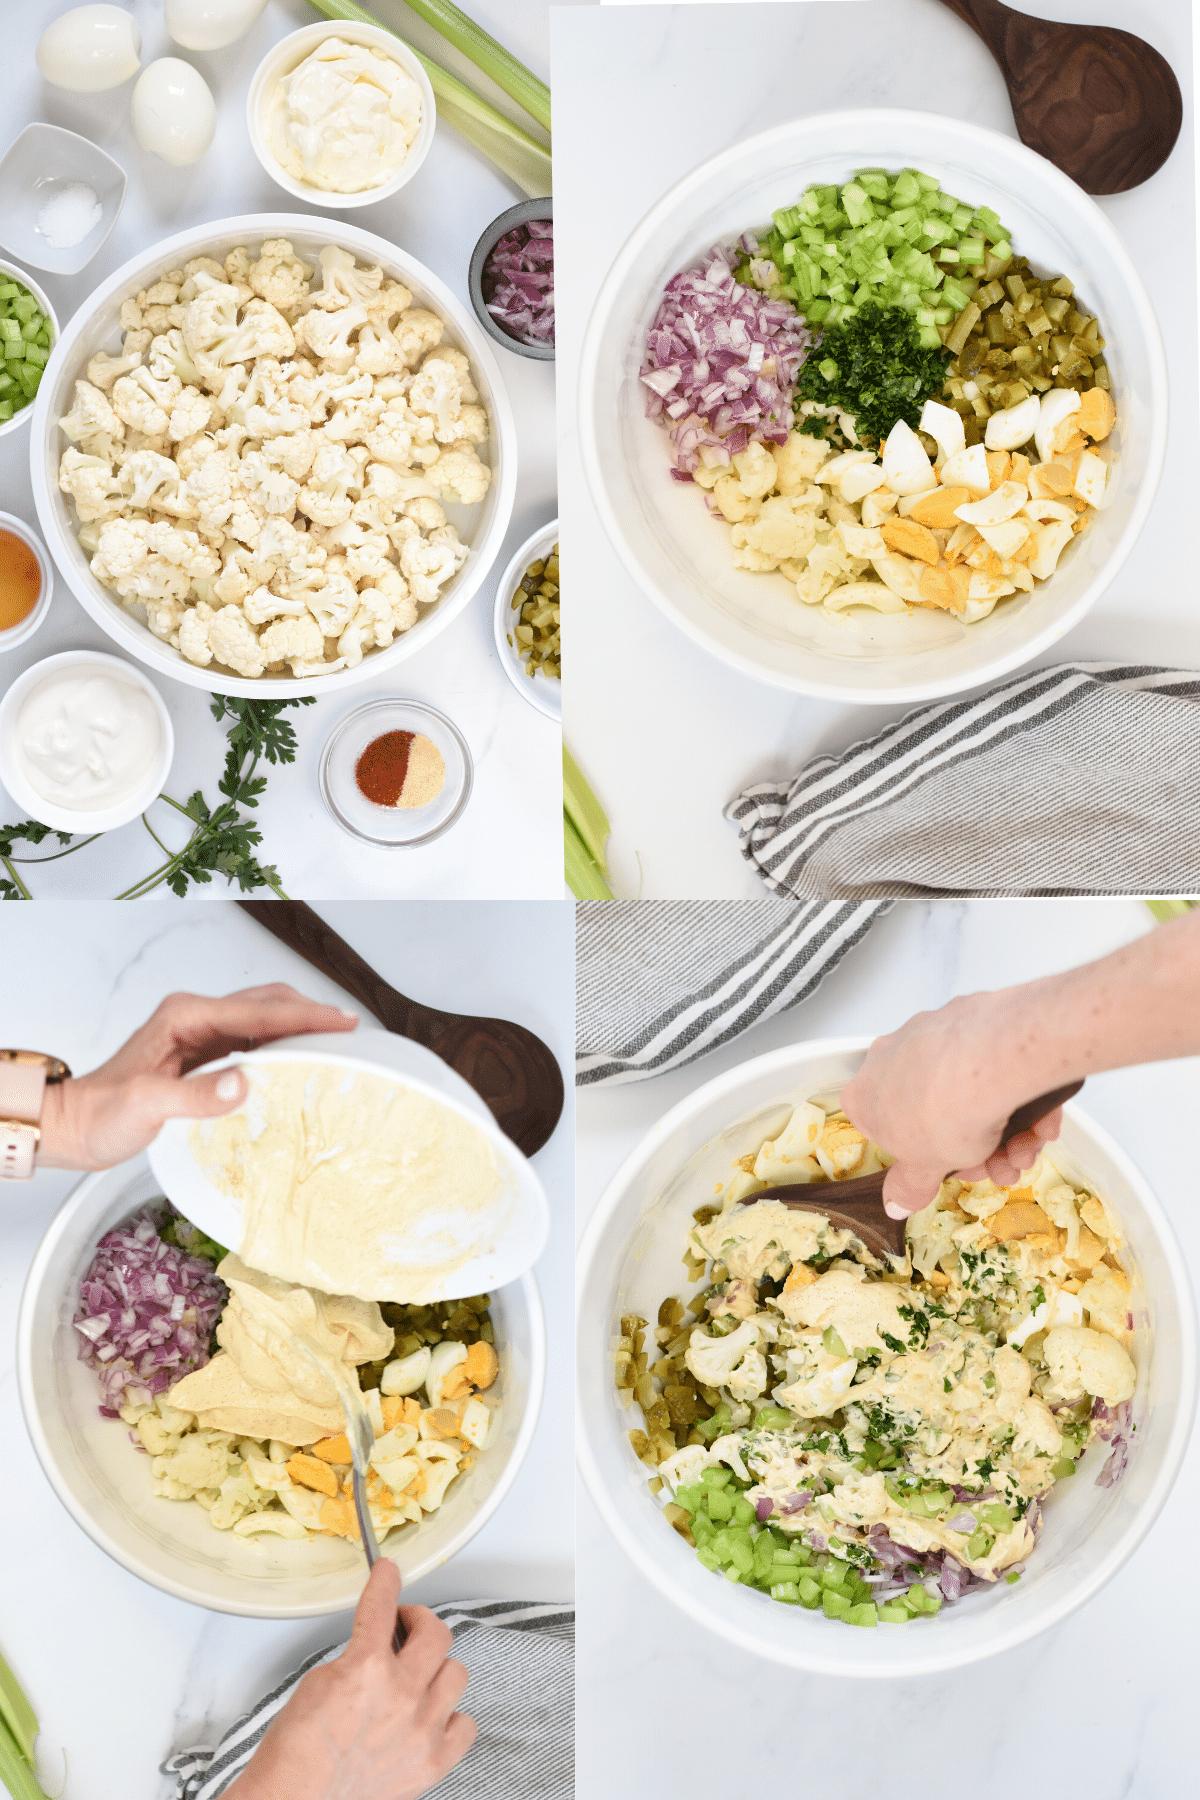 How to make Cauliflower Potato Salad